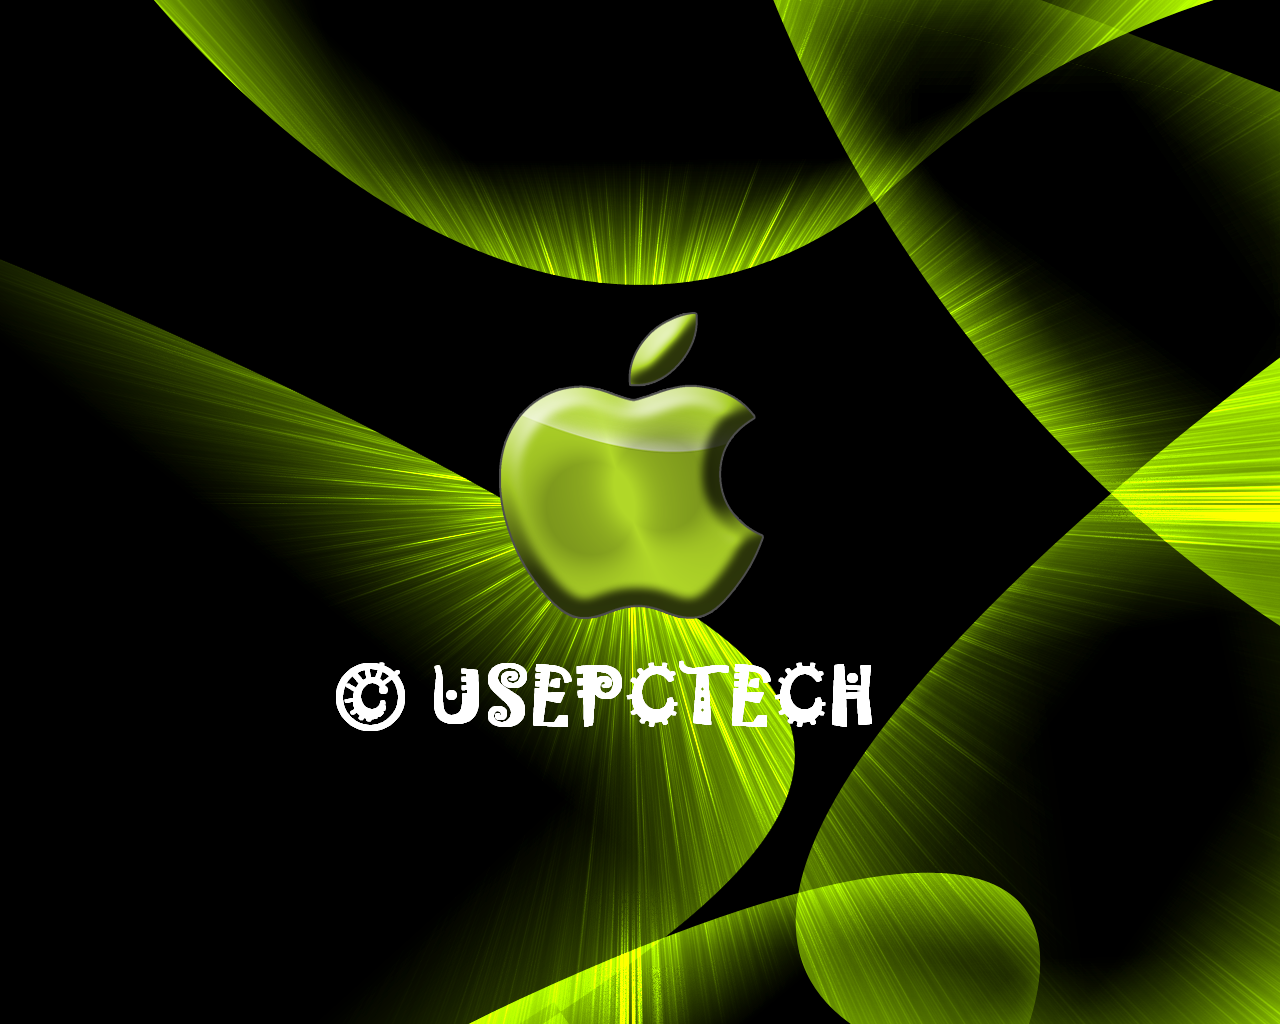 http://2.bp.blogspot.com/-YukZsWRDPsw/T1OfERW-WhI/AAAAAAAAAj0/cf-DJdpq__g/s1600/Black_aqua_wallpaper_w__apple_by_Innercityghettozone.png